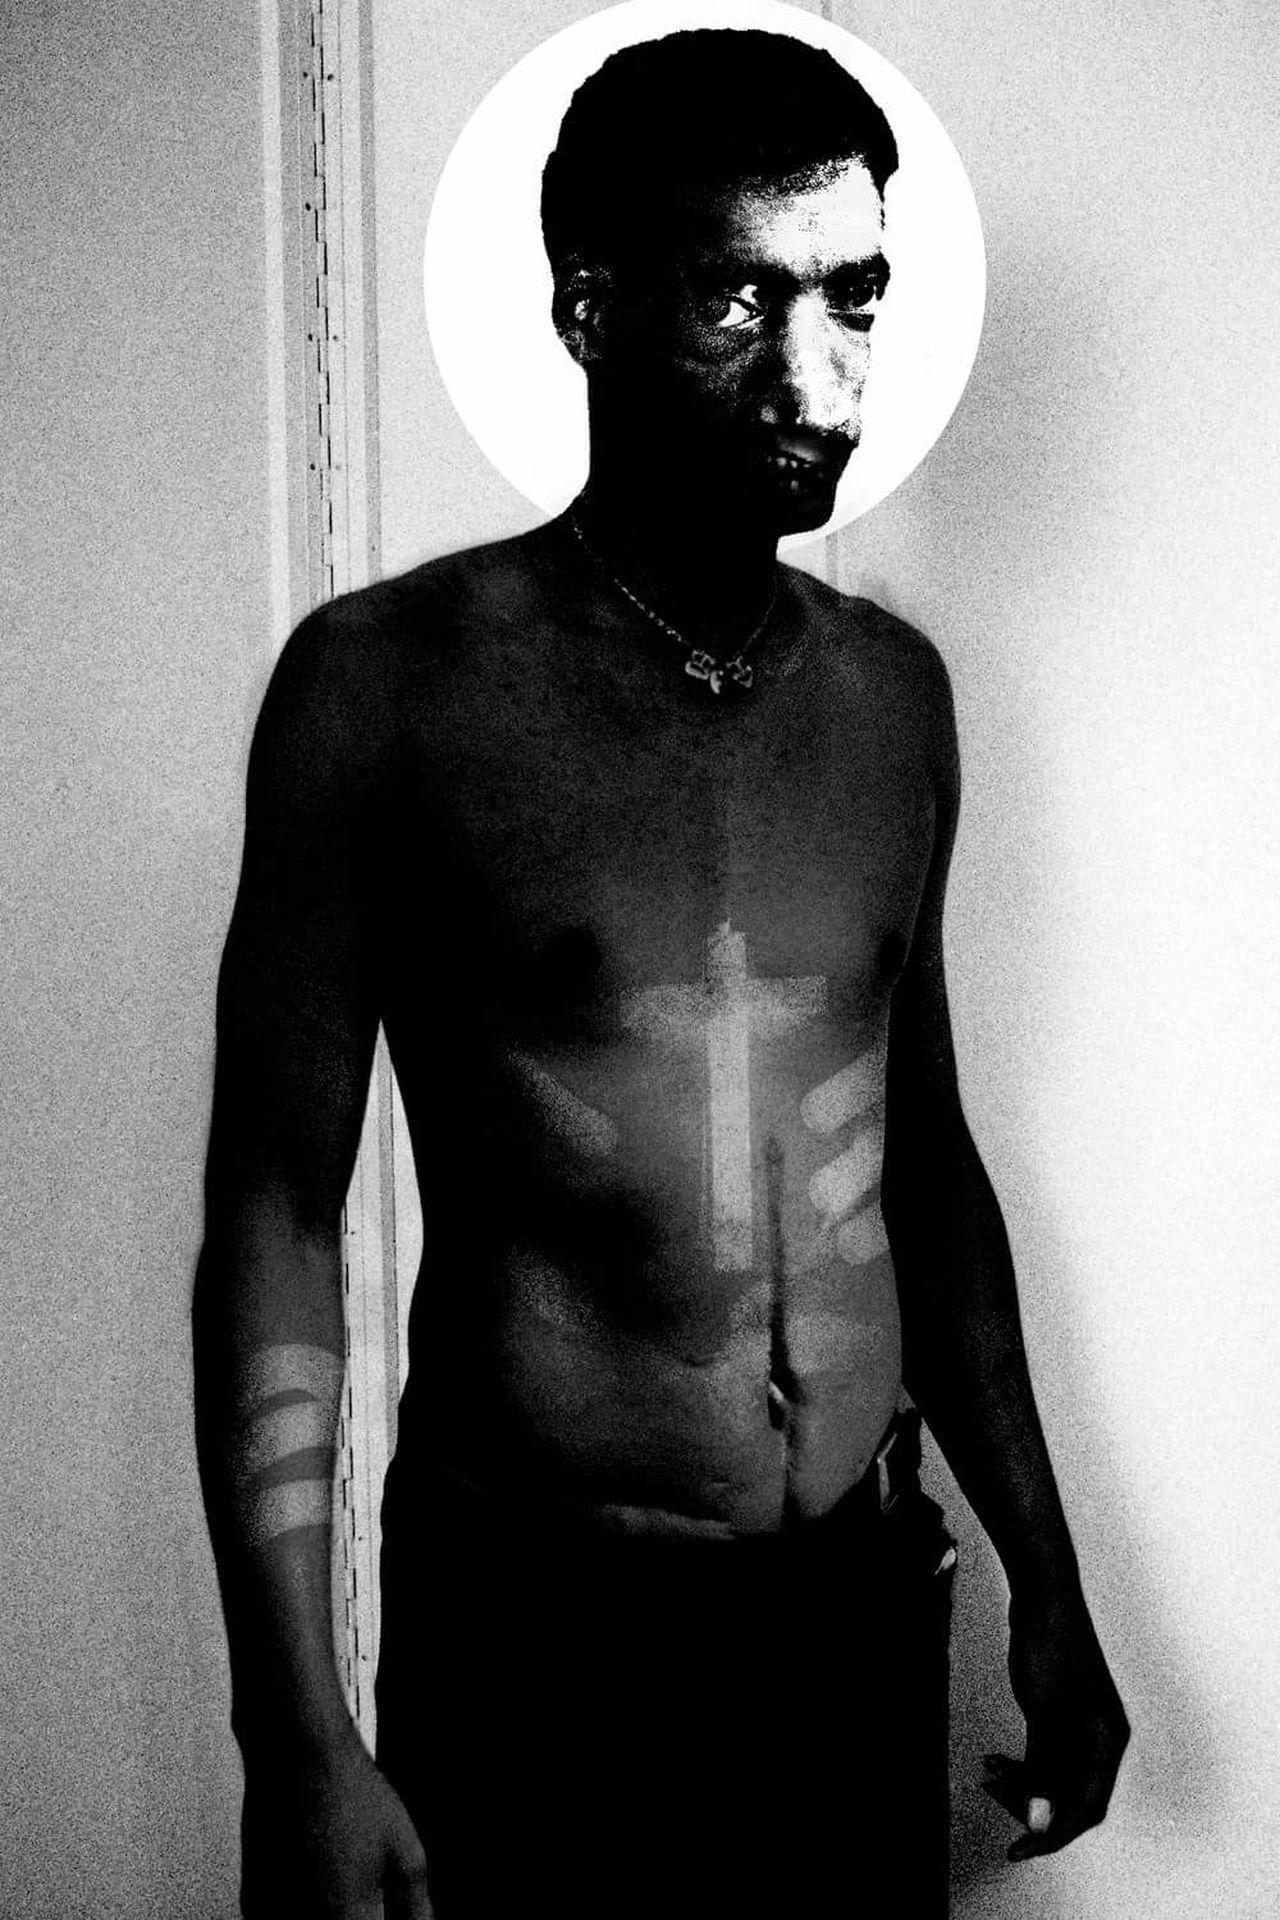 Blackandwhite Art Composition Weird Vintage Abstract Monster Portrait